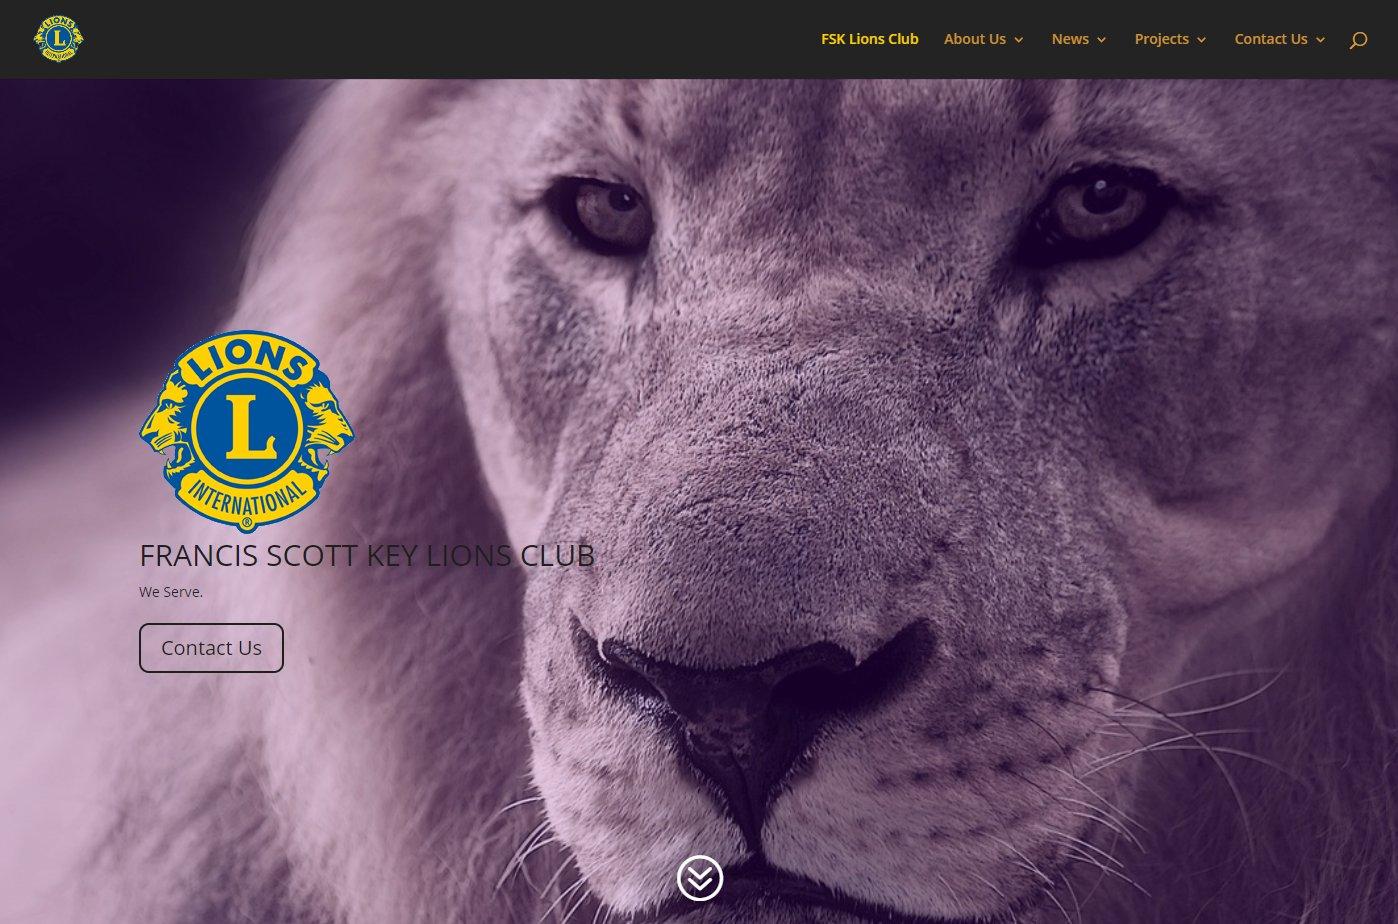 FSK Lions Club Website Image